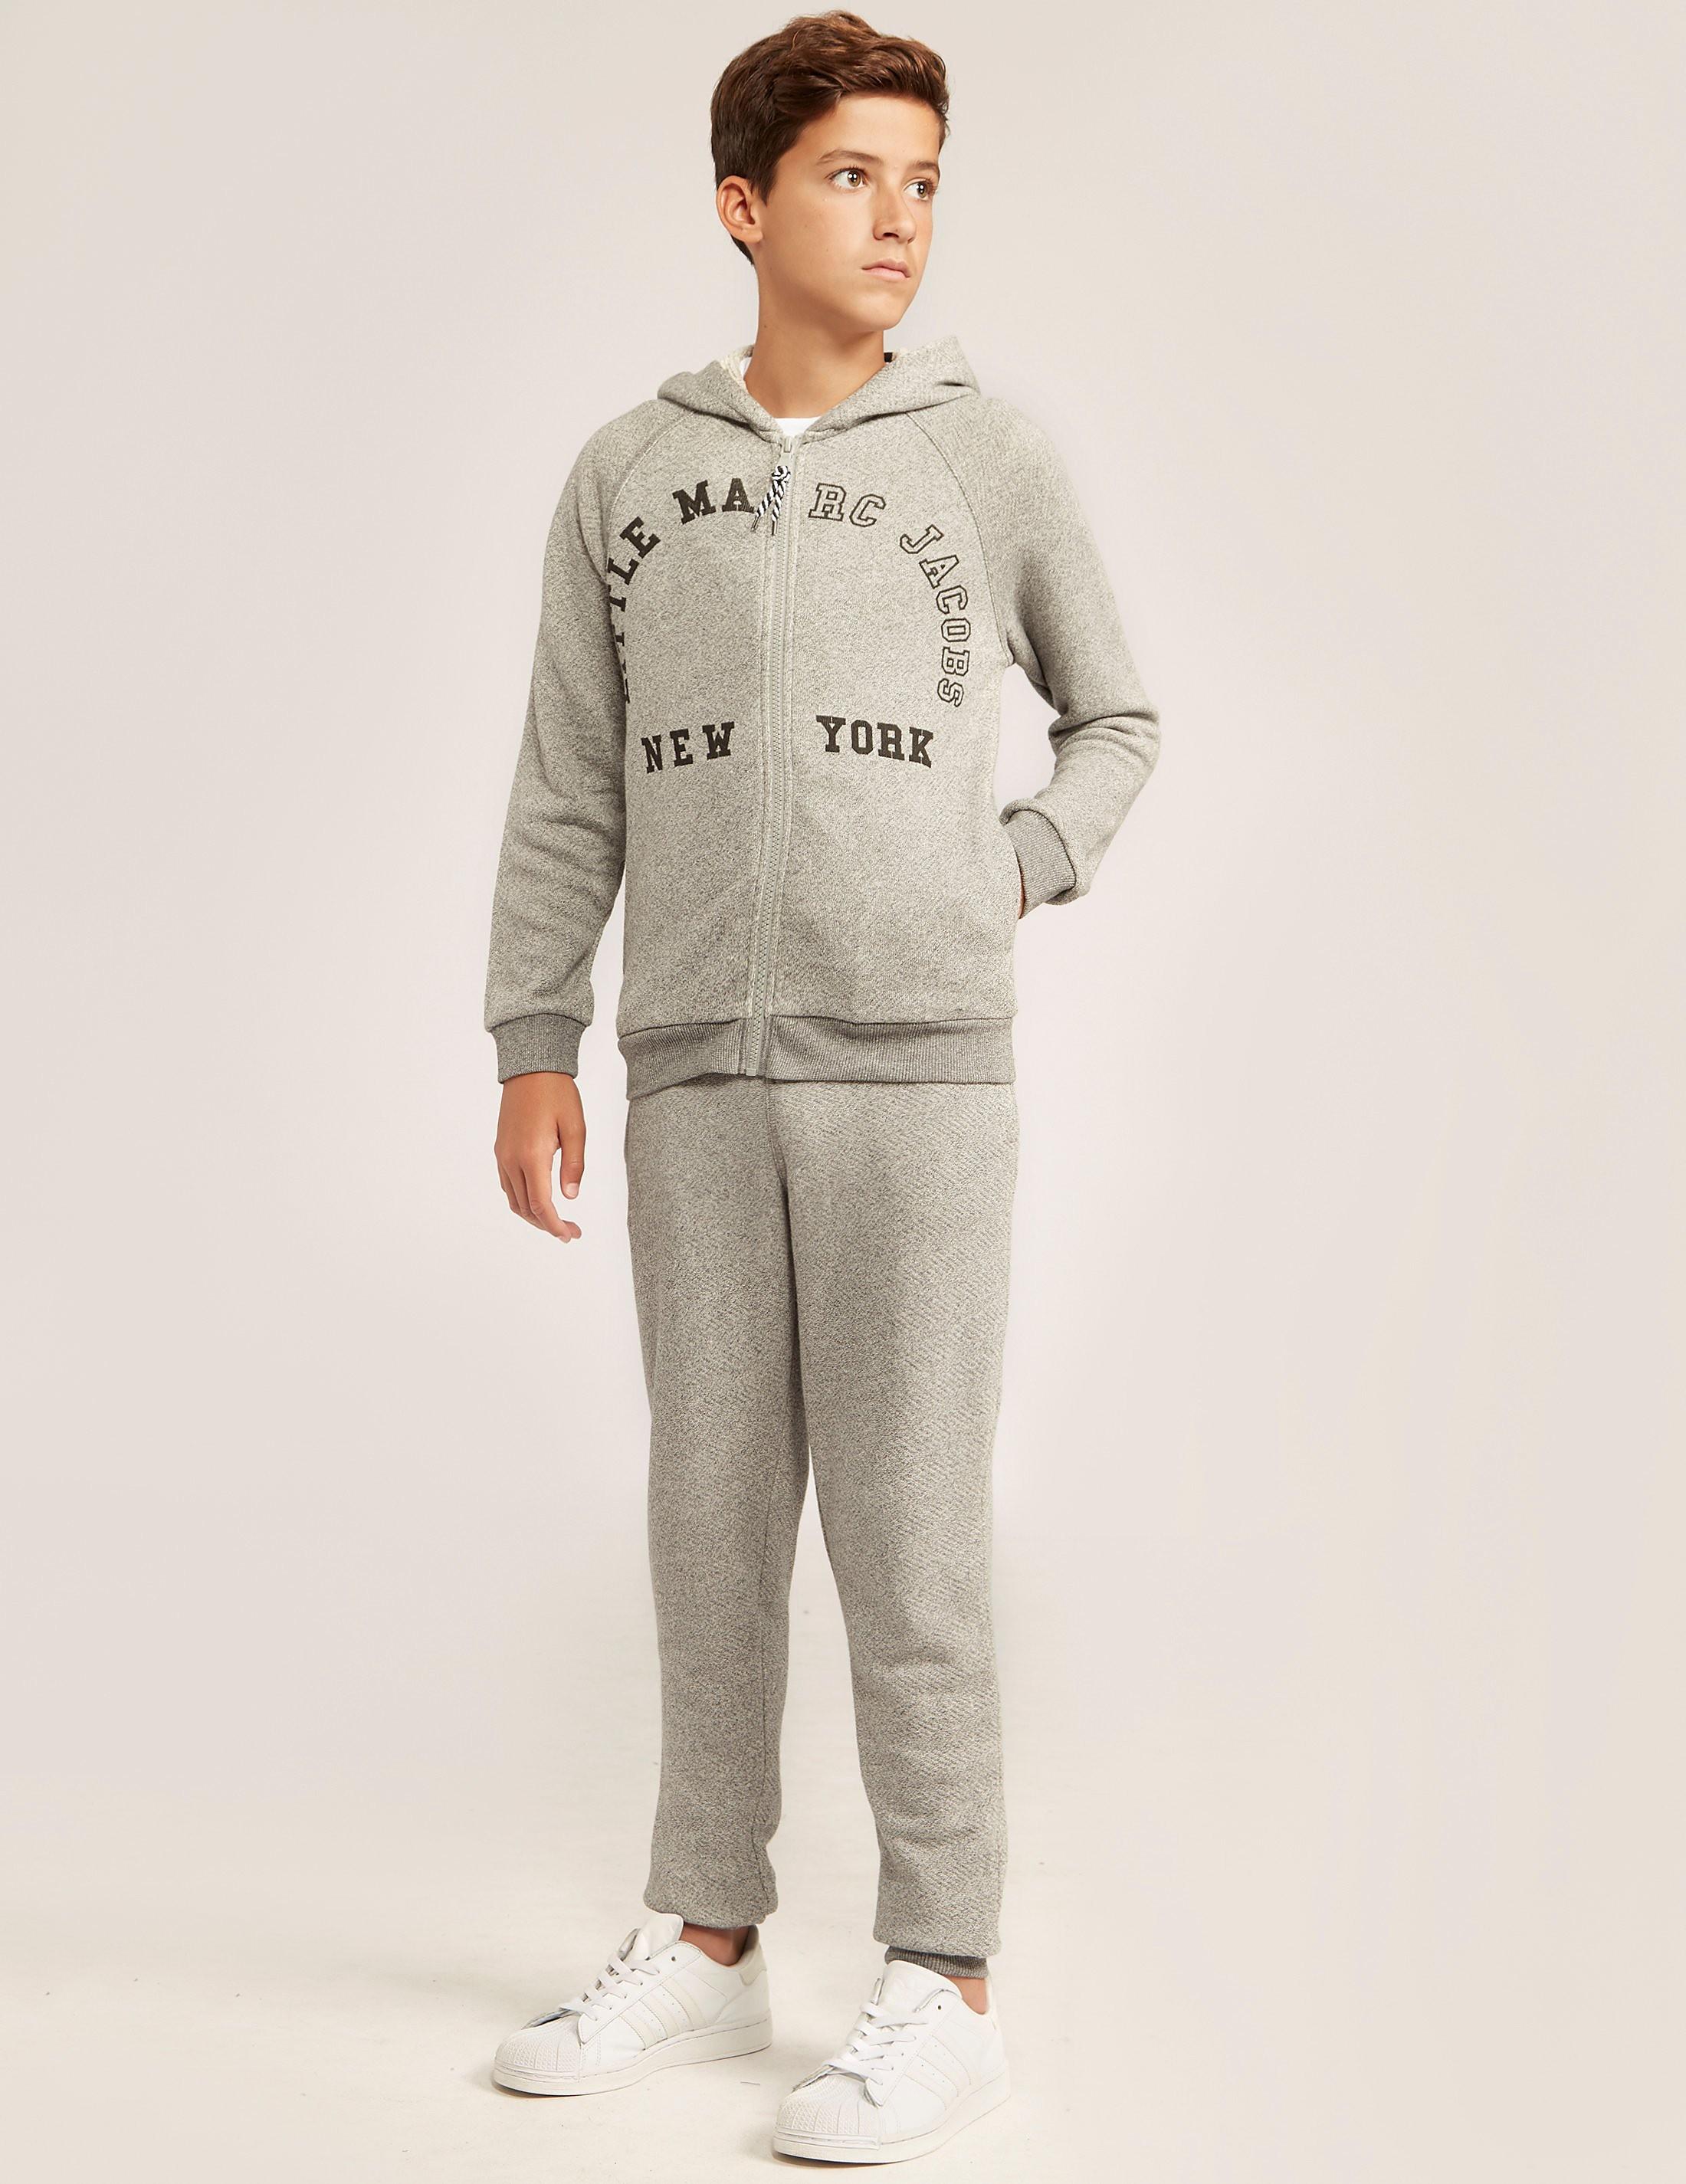 Little Marc Jacobs Kids' Sweatshirt